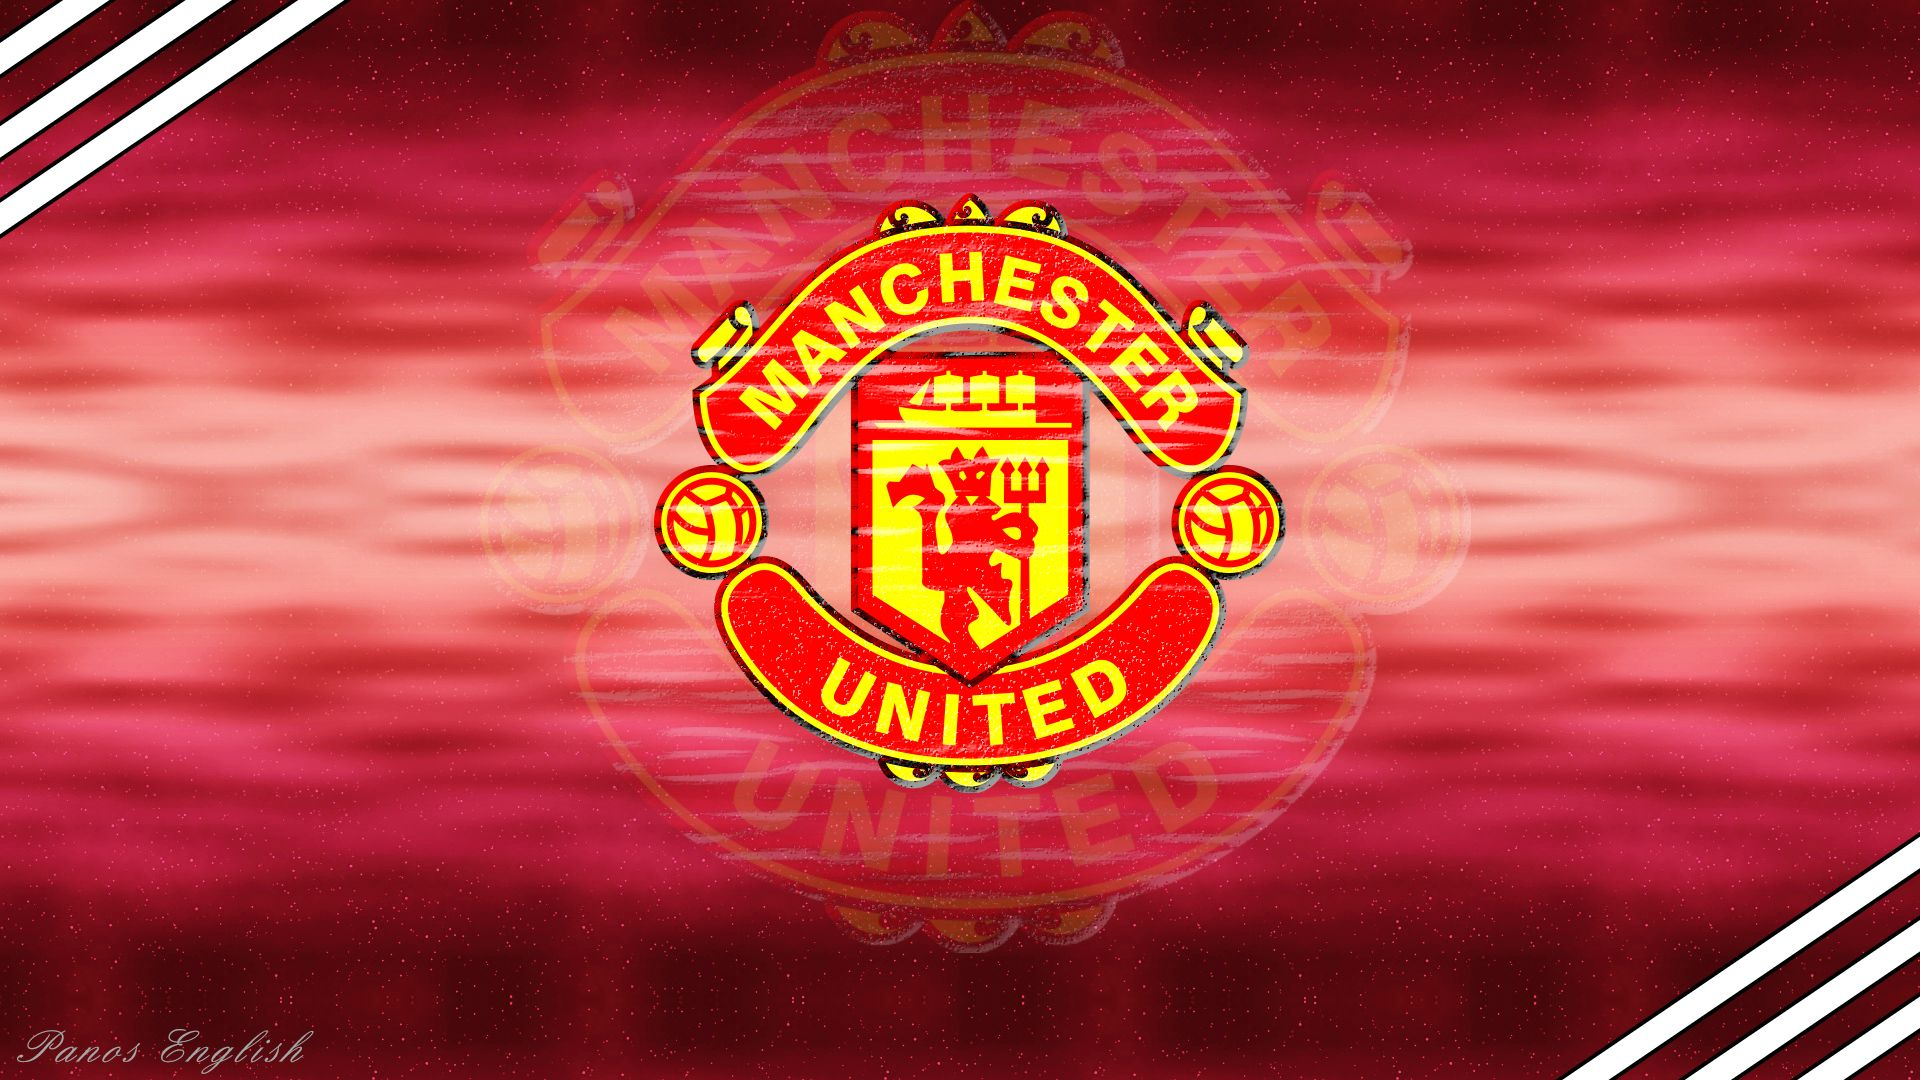 Manchester united wallpaper 1920x1080 impremedia manchester united logo id 109271 buzzerg voltagebd Image collections